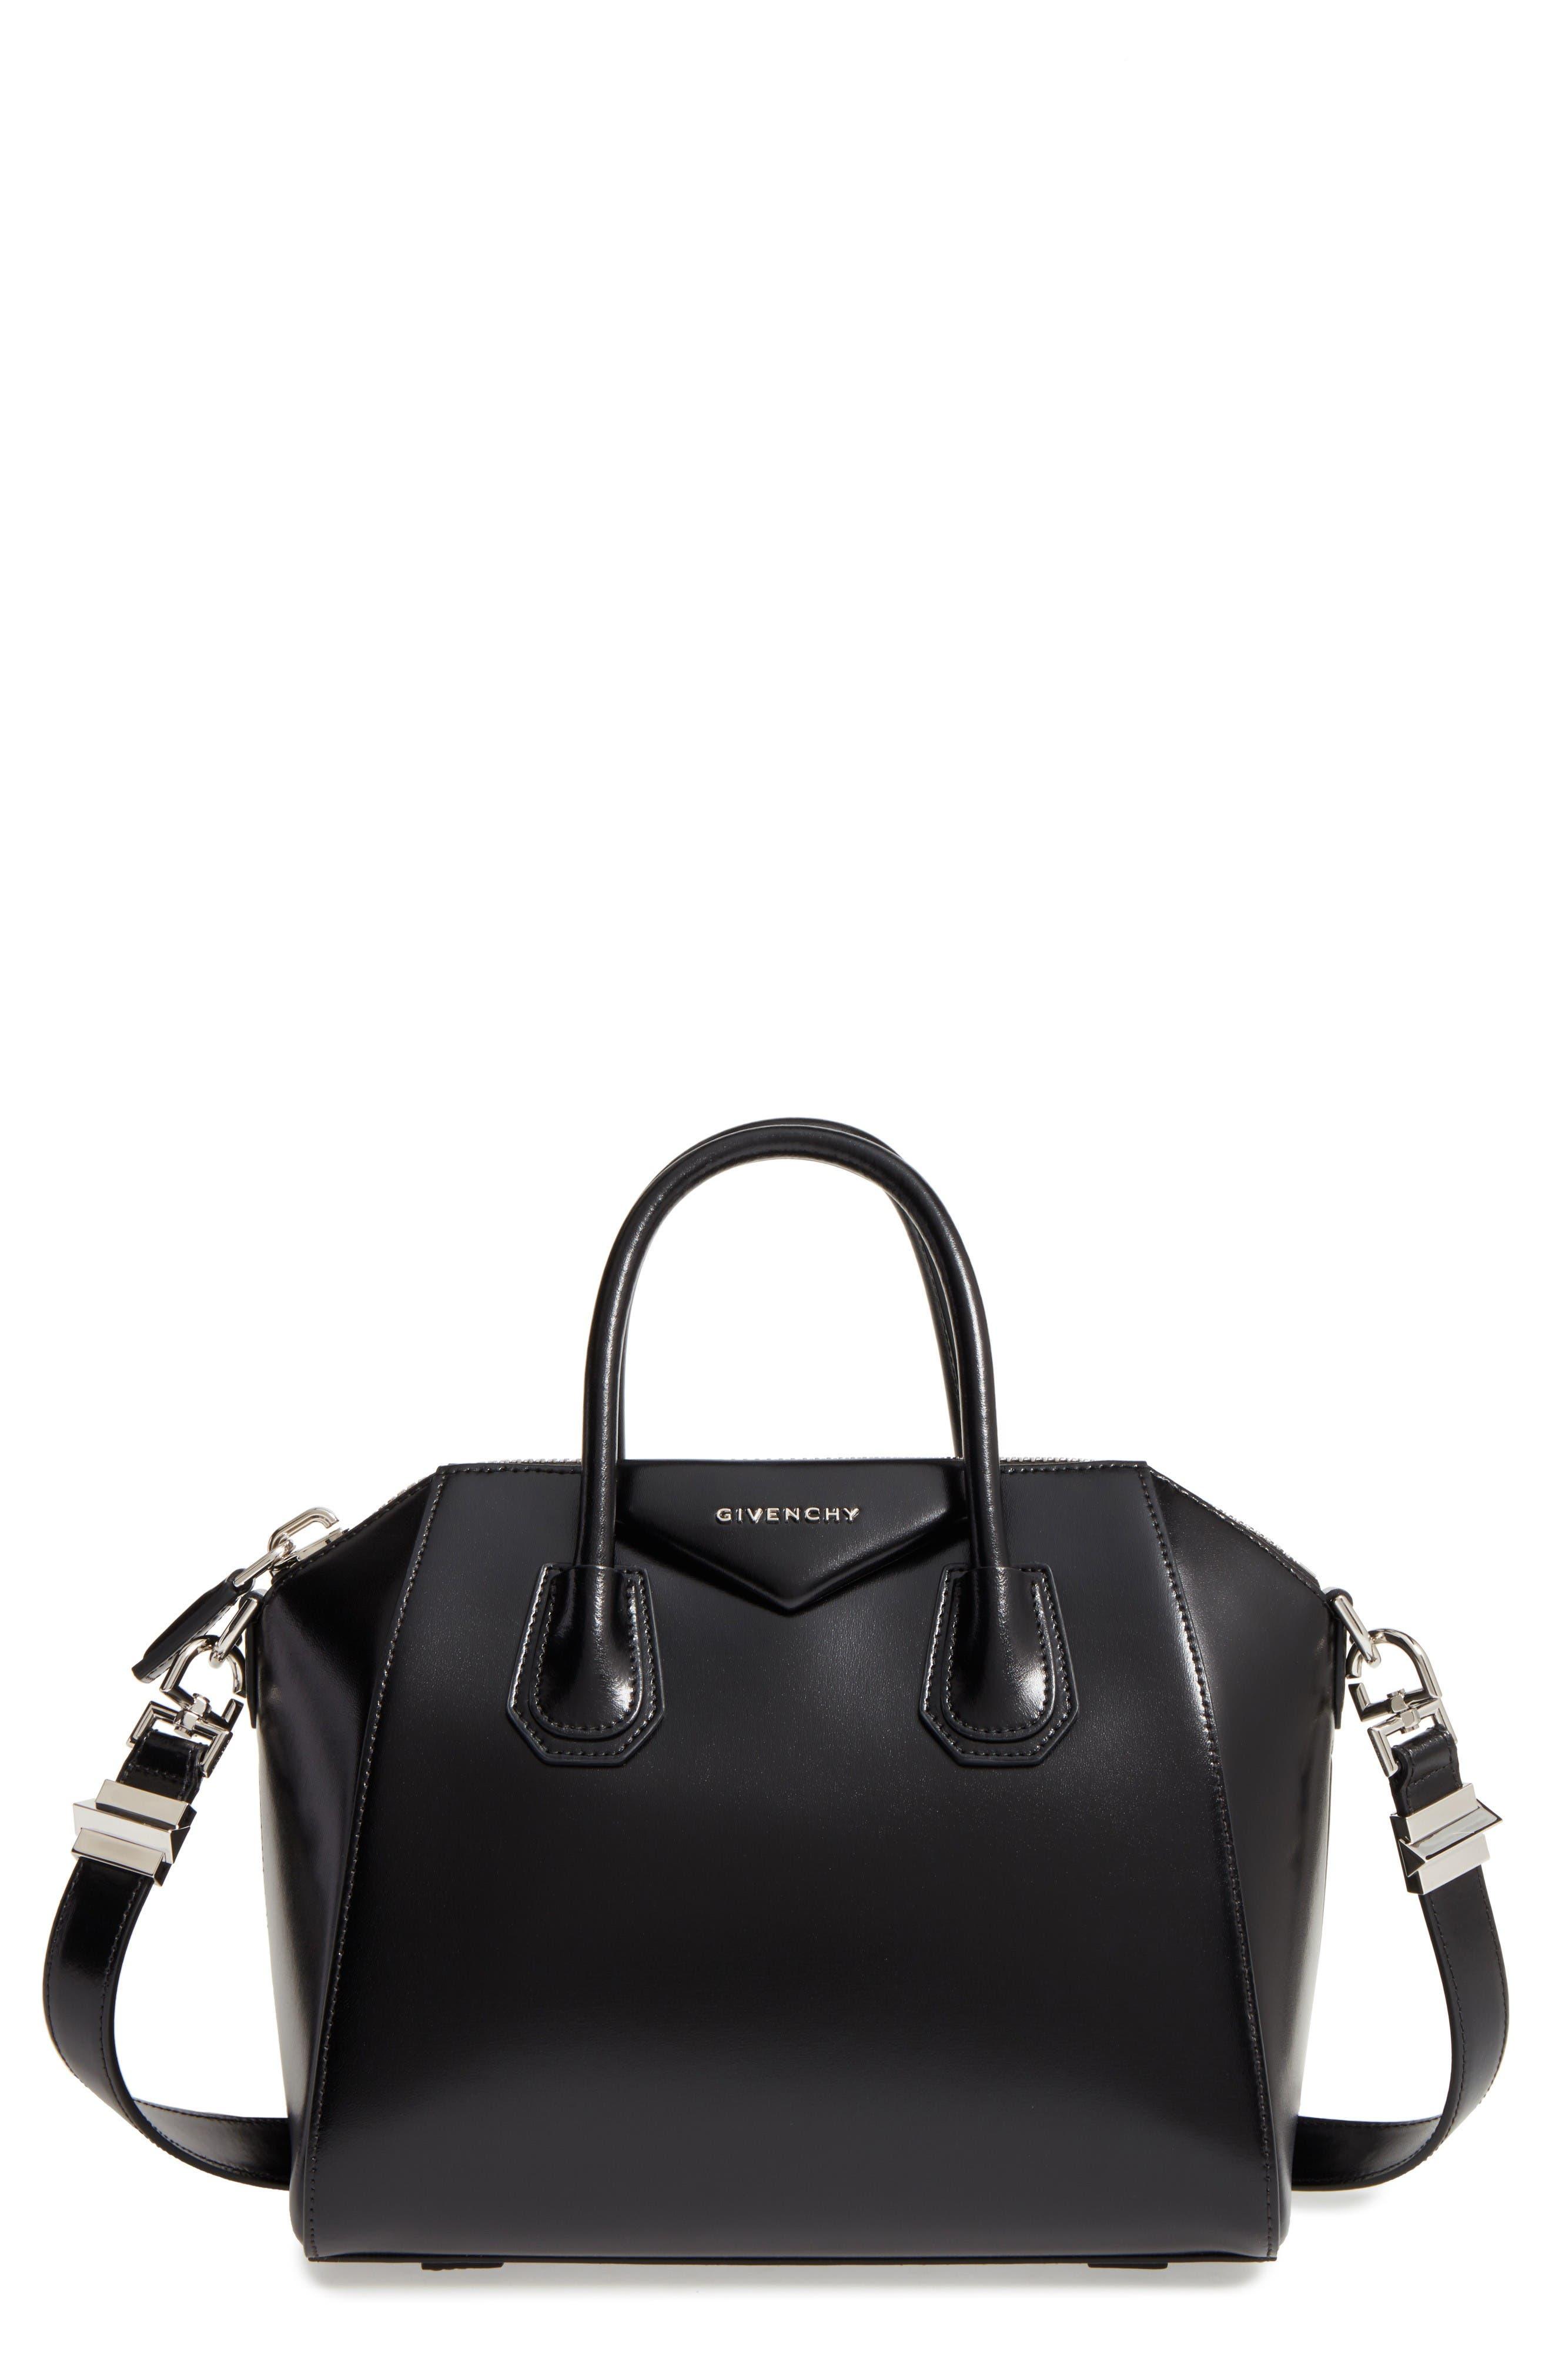 Alternate Image 1 Selected - Givenchy Small Antigona Box Leather Satchel